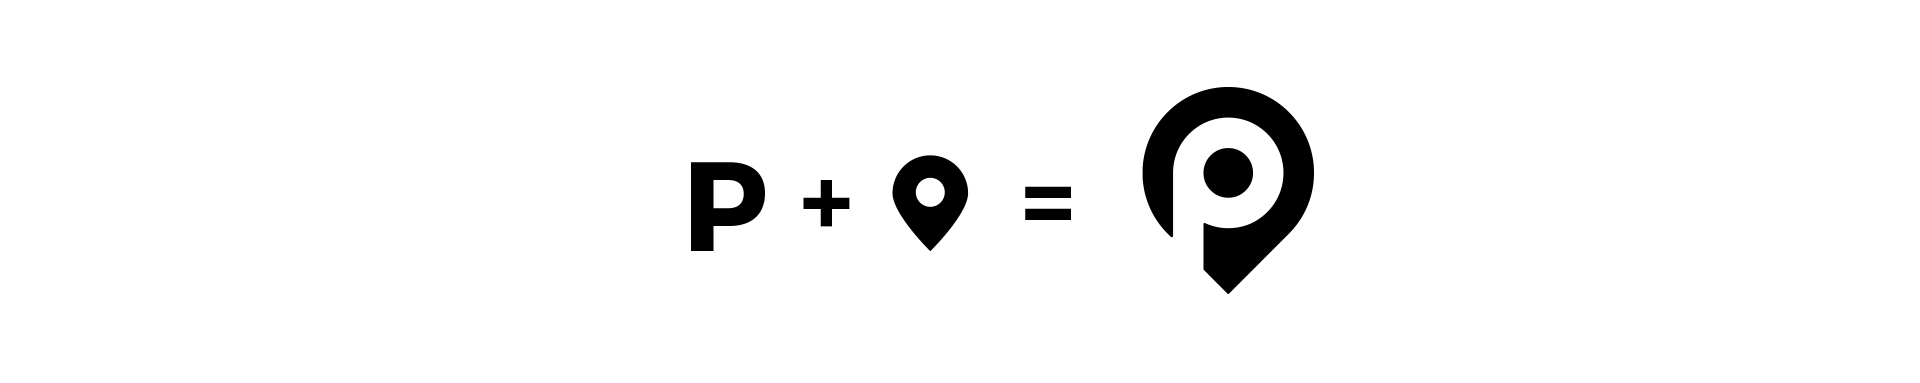 pinpoint_graphic_design_logo_denver_jimmy_bowron_4.jpg